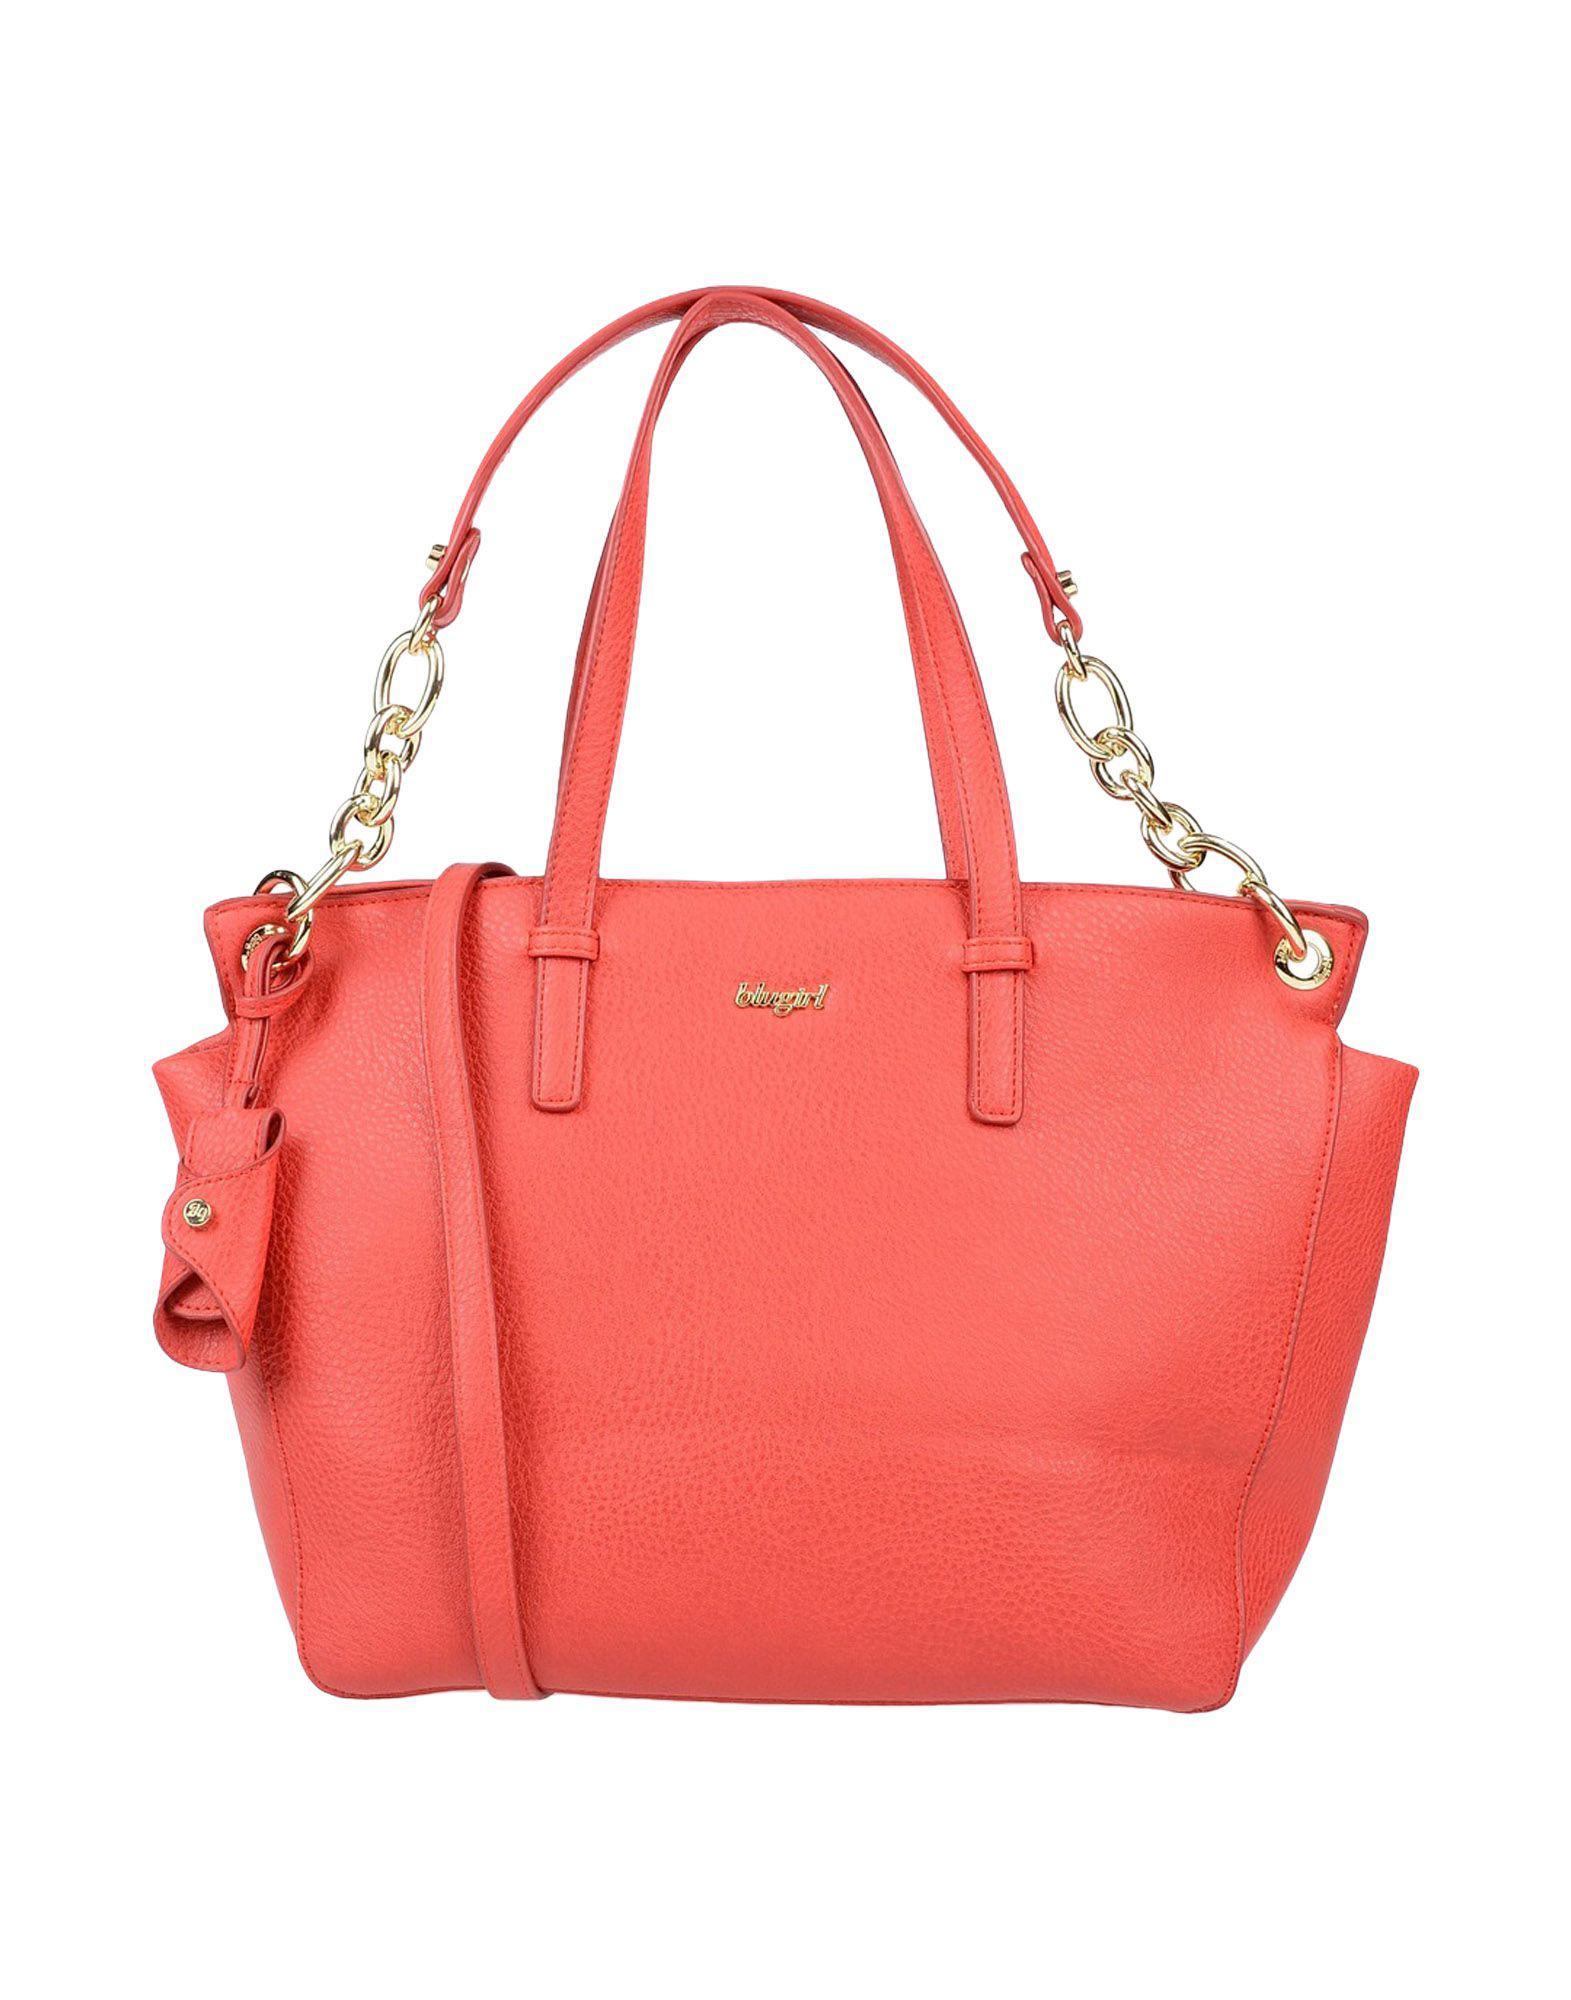 69fe40b7c718 Lyst - Blugirl Blumarine Handbag in Red